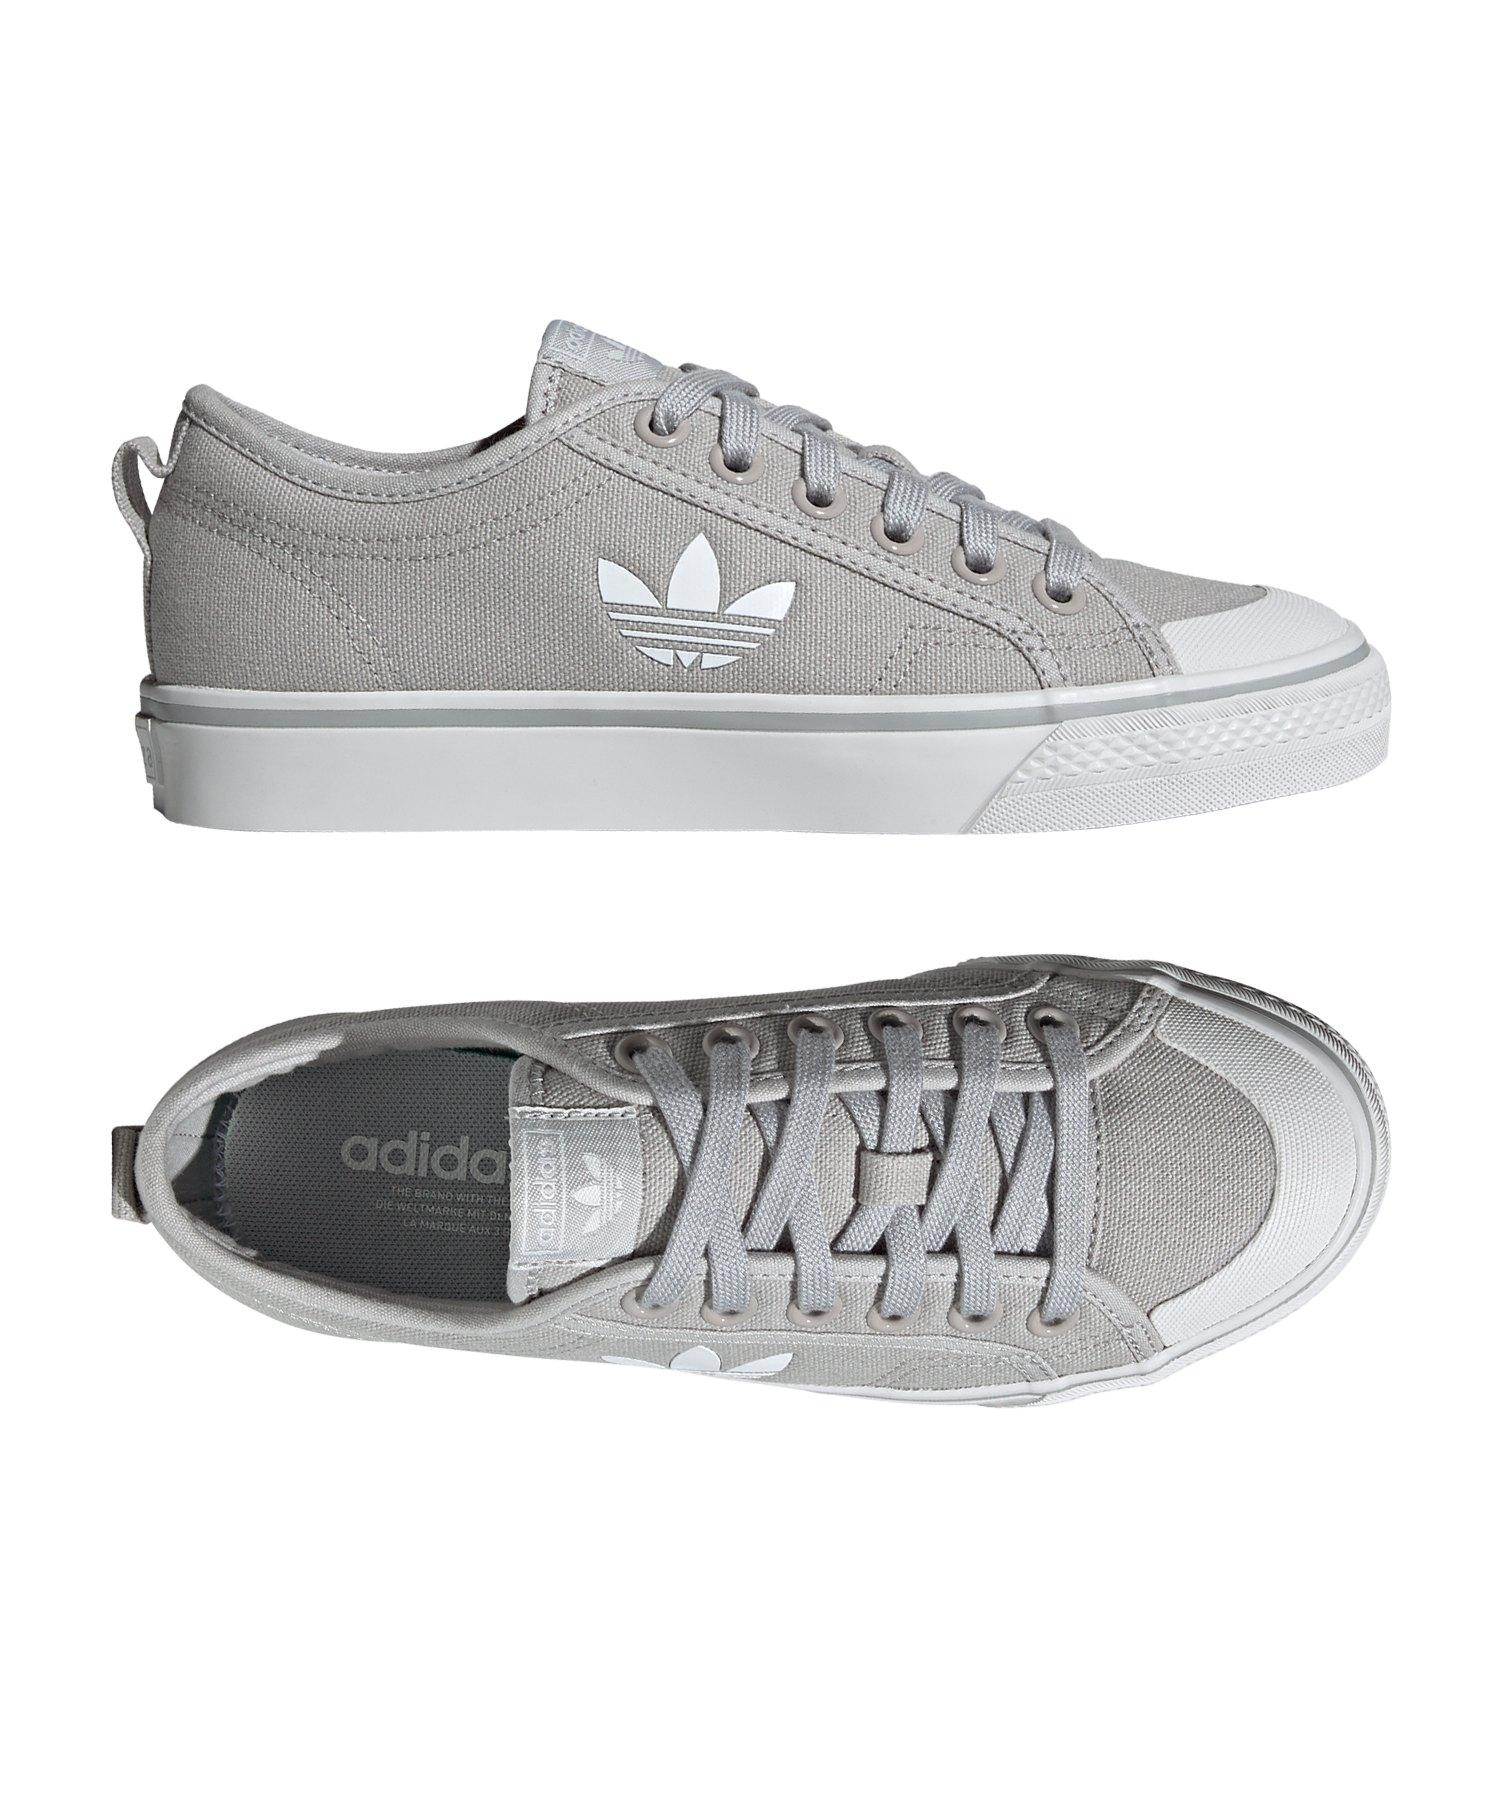 adidas Originals Nizza Sneaker für Damen Grau